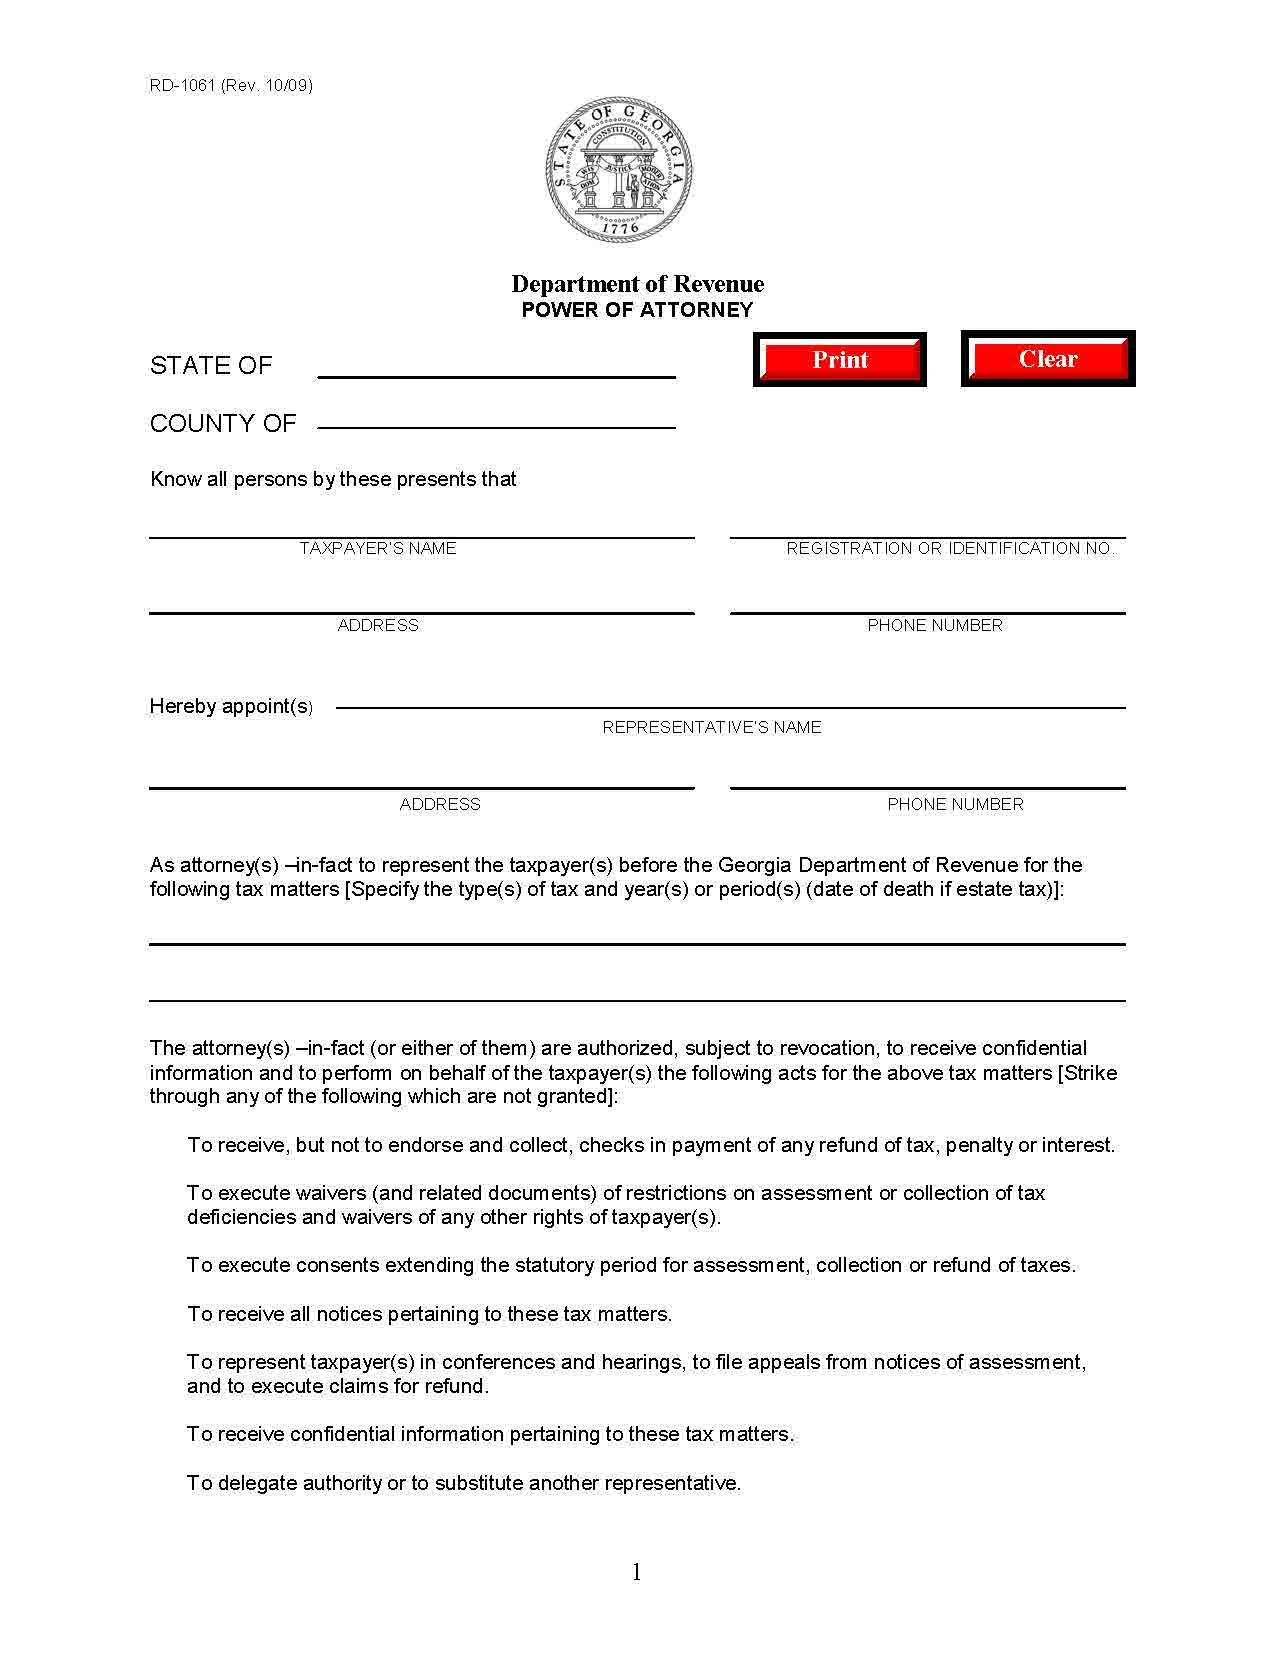 Georgia Tax Power Of Attorney Form 2 PDF PDF Format E